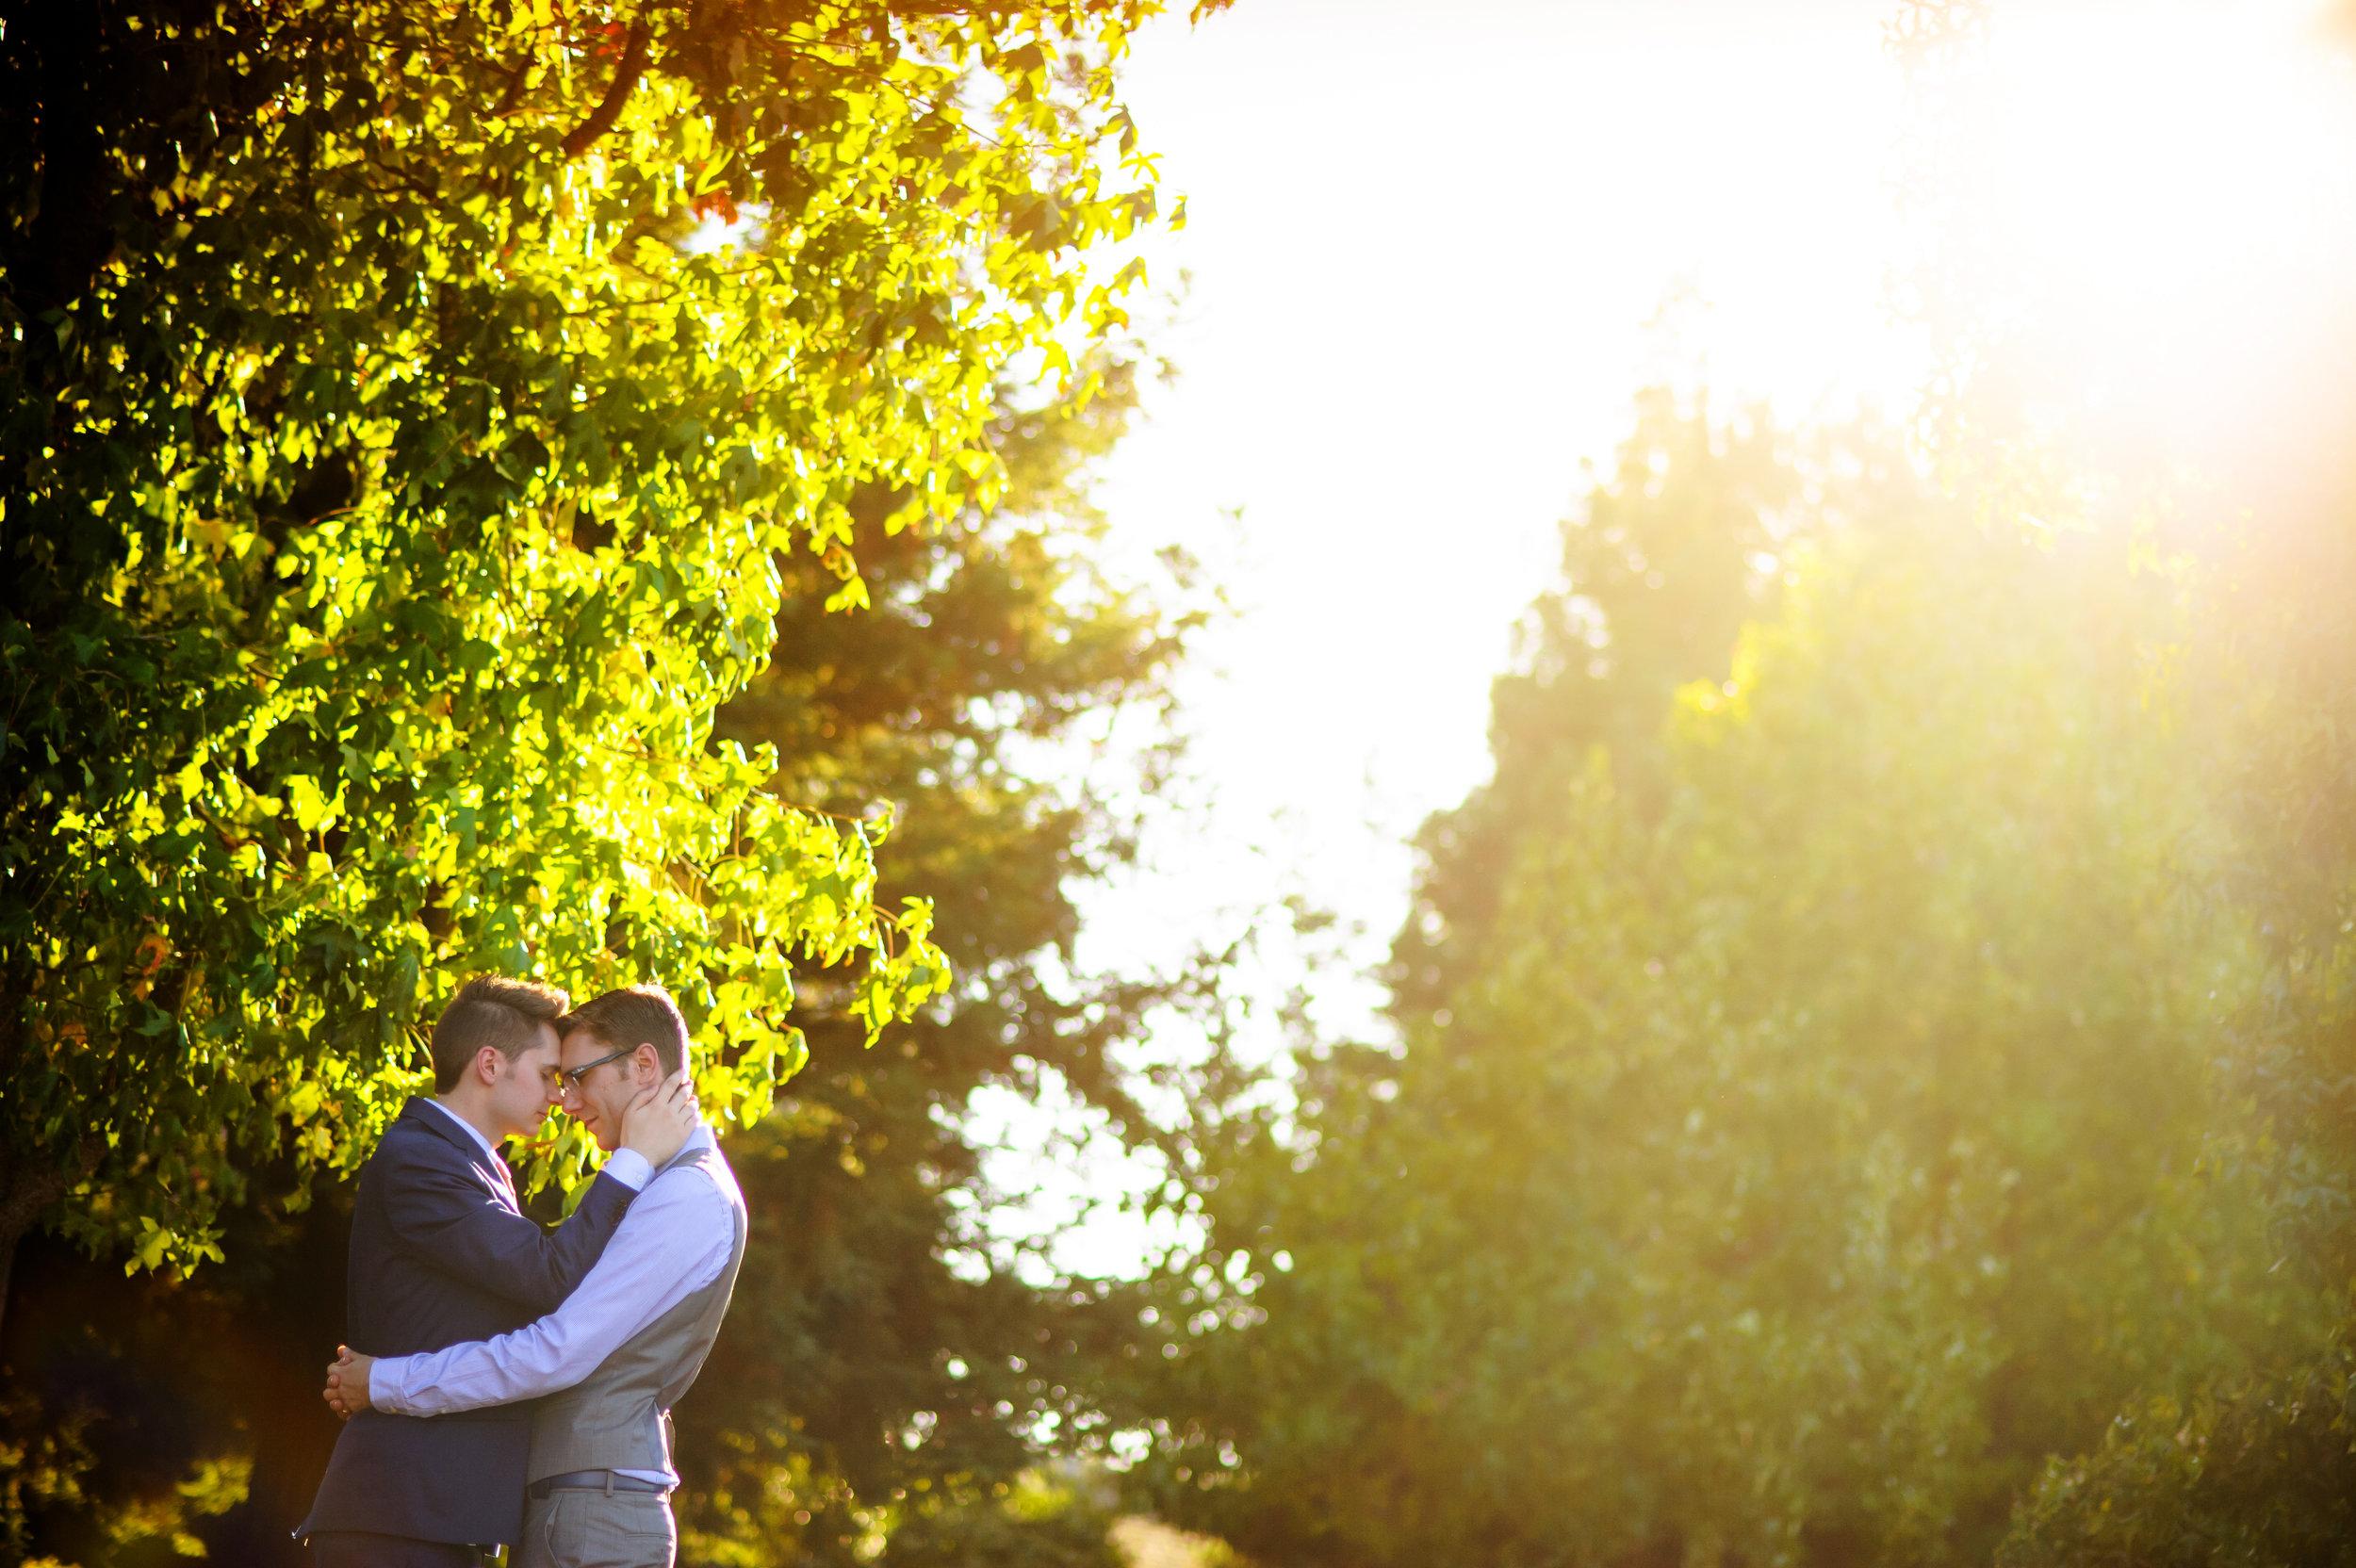 josh-parker-001-same-sex-sacramento-wedding-photographer-katherine-nicole-photography.JPG